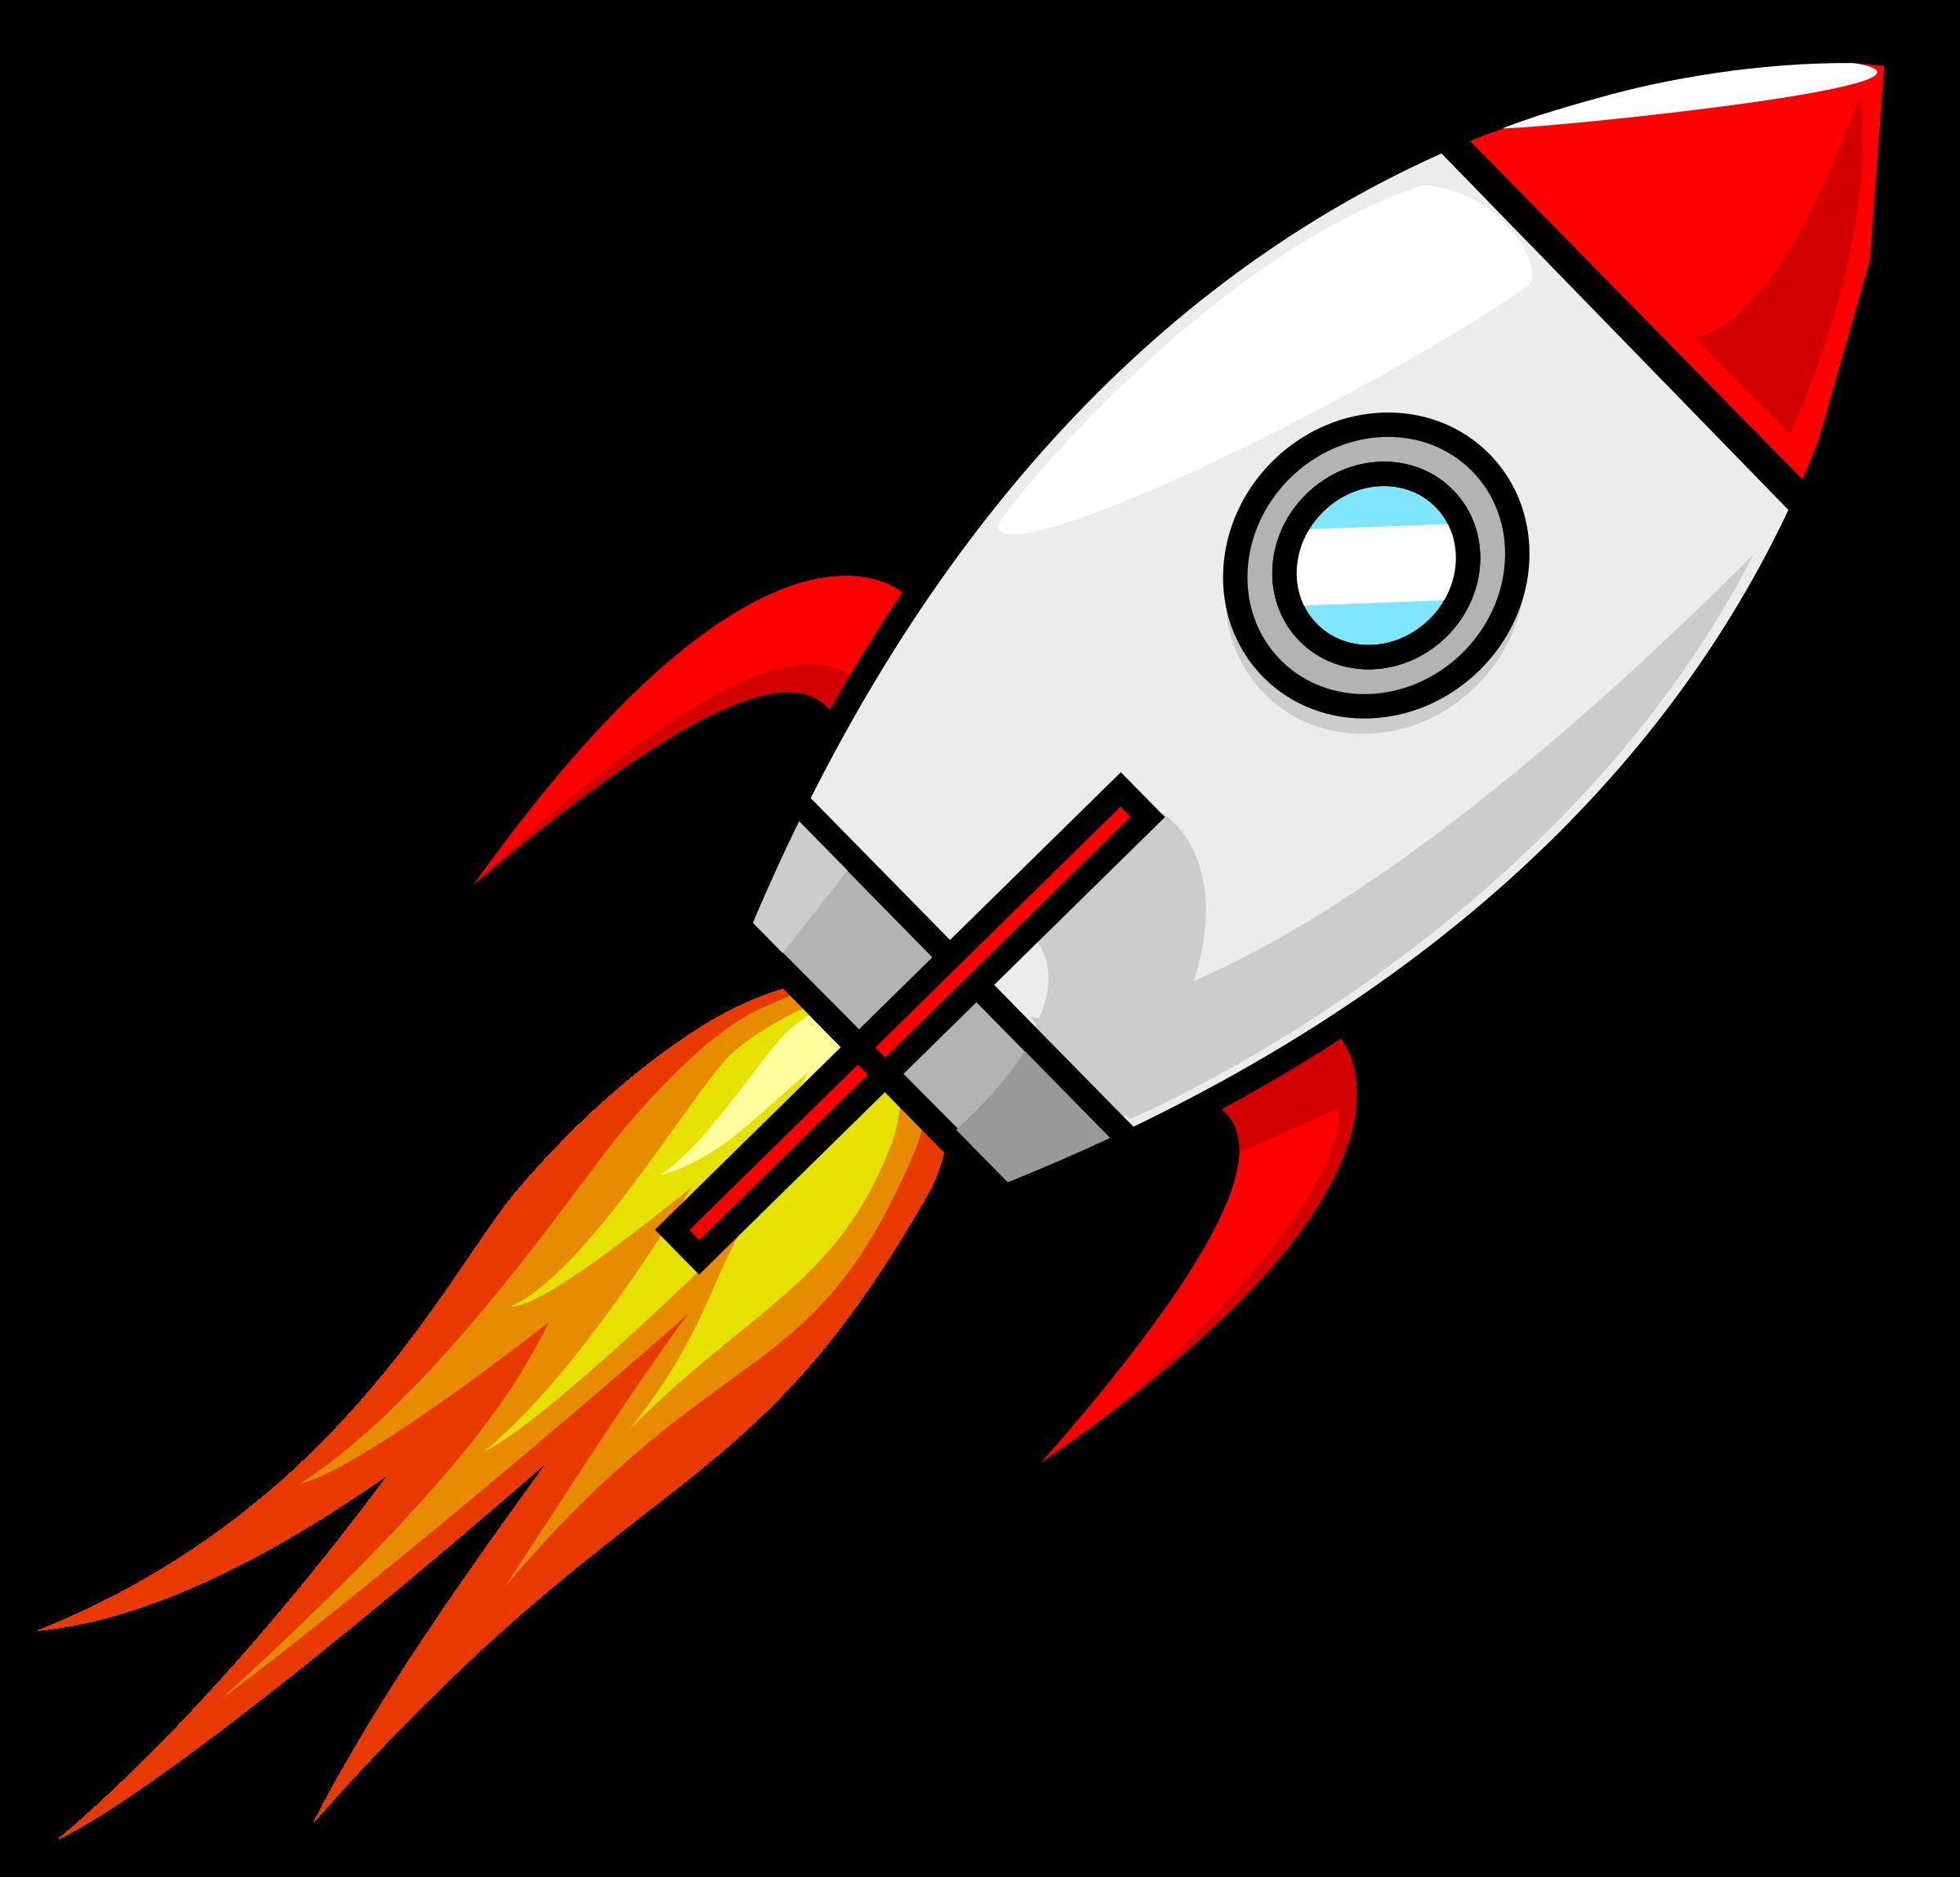 Spaceship clipart simple. Cartoon moon rocket remix